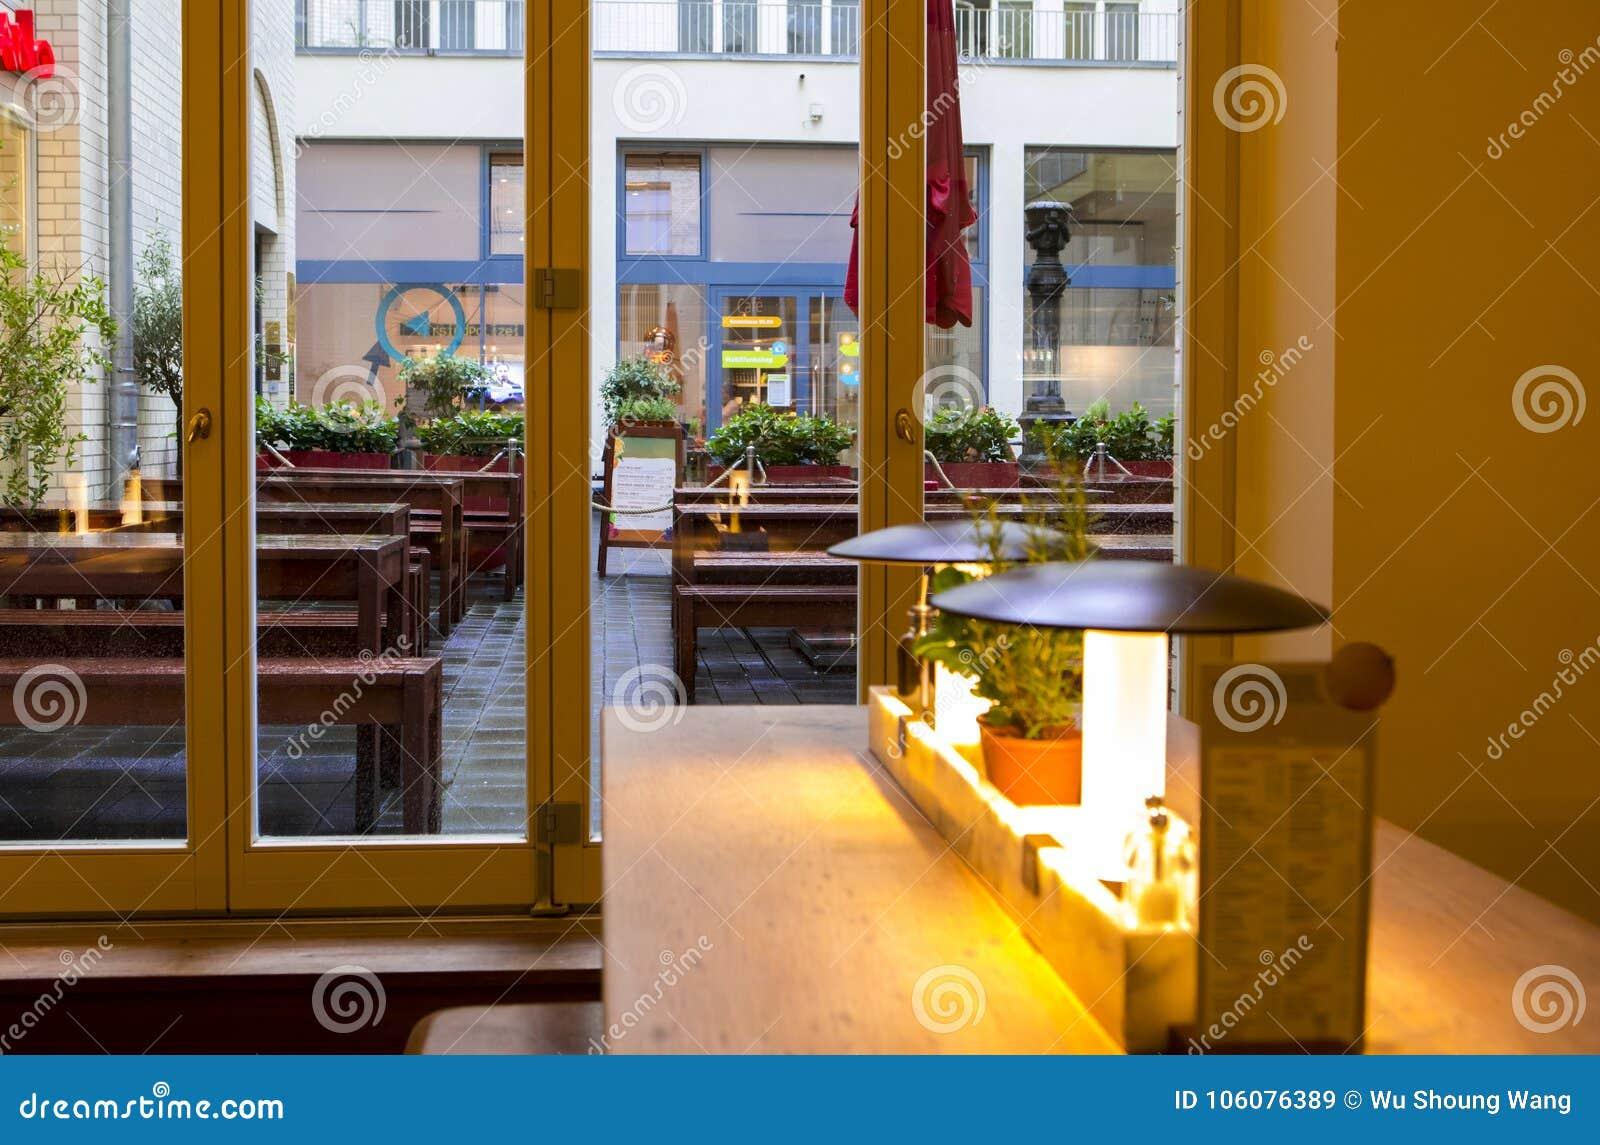 Germany Berlin Italian Restaurant Buffet Restaurant Interior Design Elegant And Warm Modern Fashion Is Very Simple Editorial Stock Image Image Of Trendy Dining 106076389